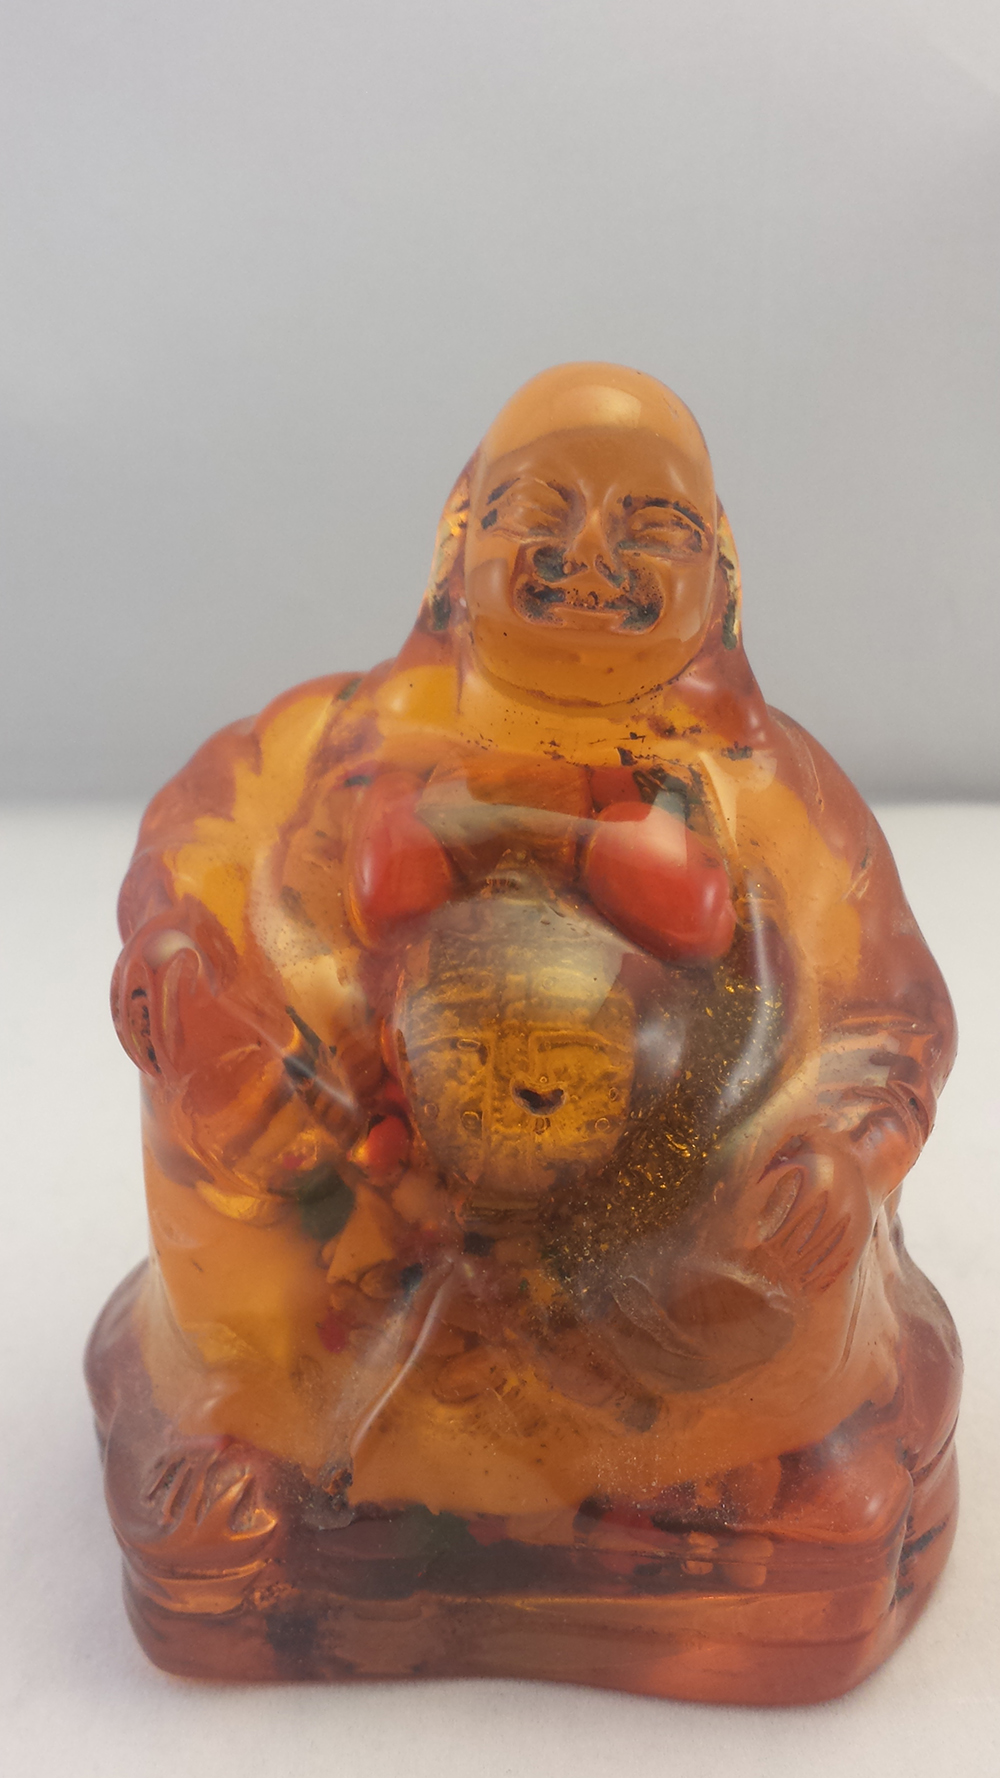 Embedded Acrylic Laughing Buddha